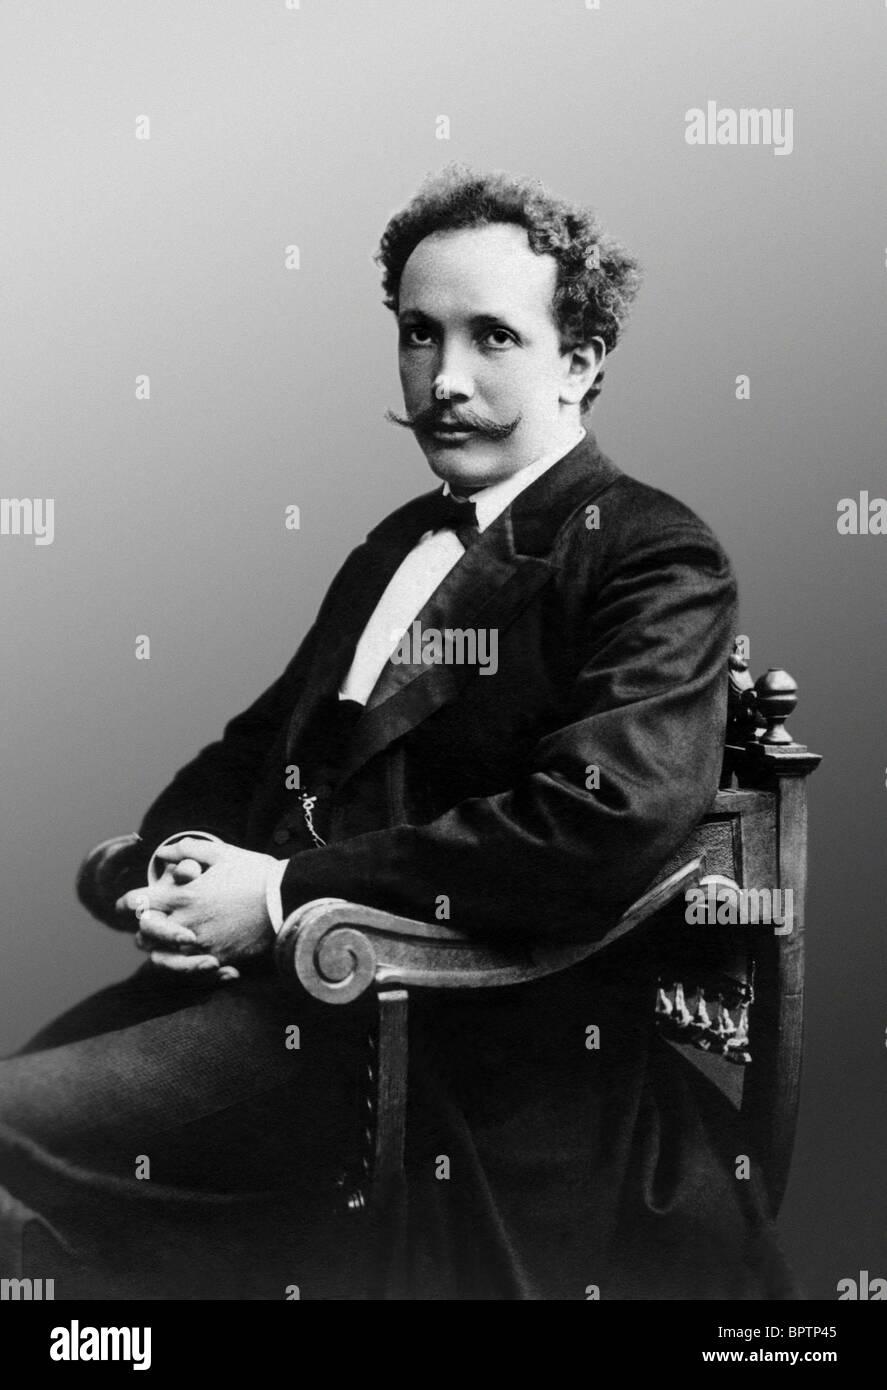 RICHARD STRAUSS COMPOSER (1894) Stock Photo